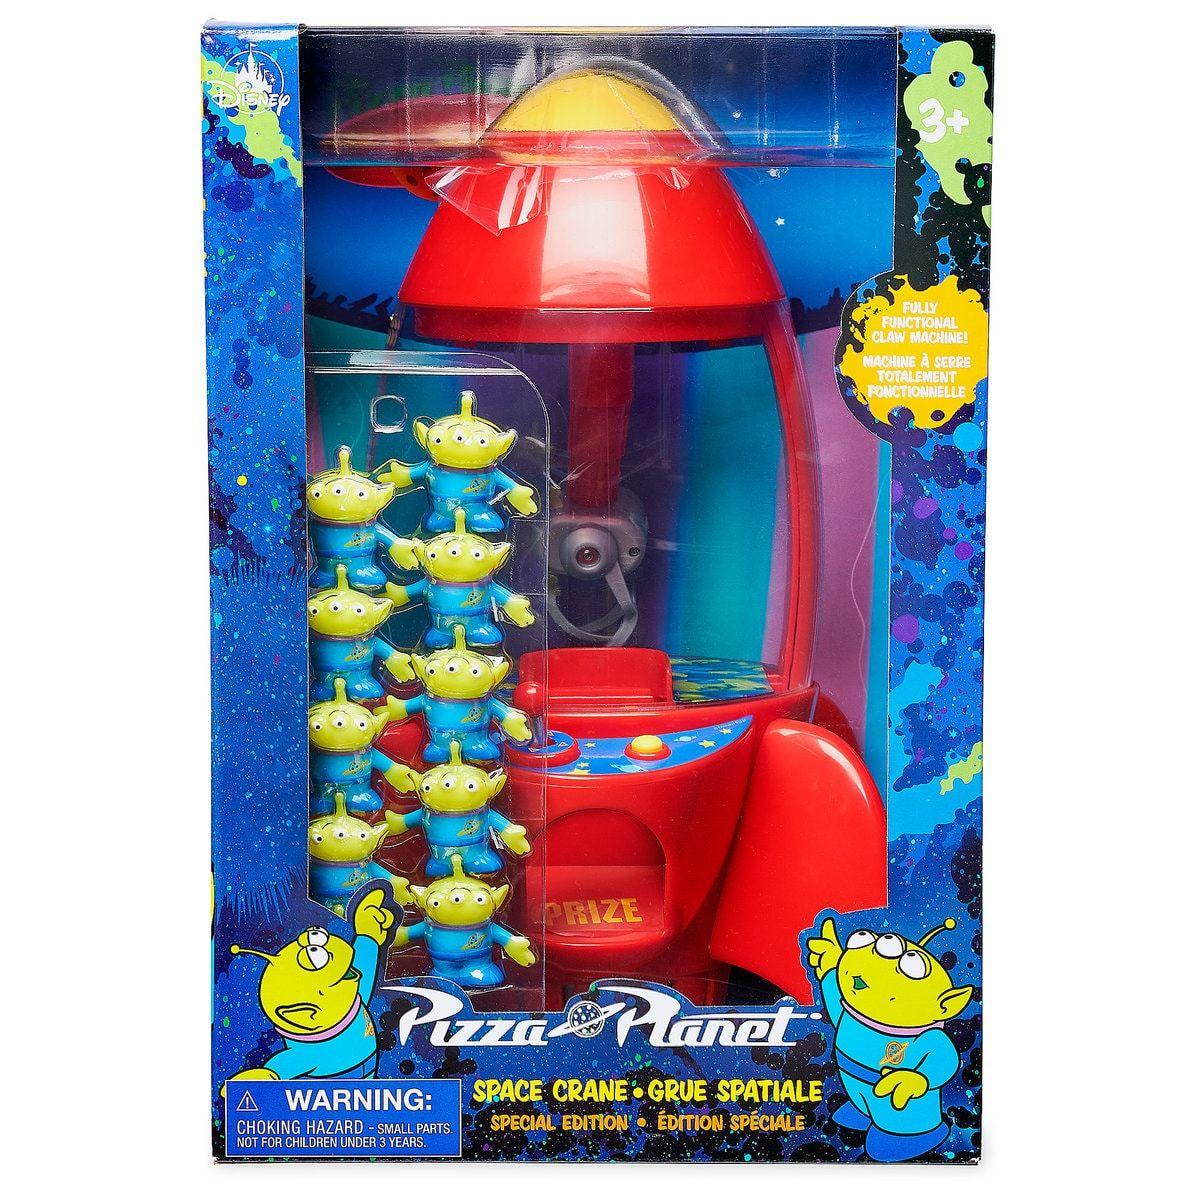 Disney Store Toy Story Alien Claw Rocket Pixar Pizza Planet Space Crane Special